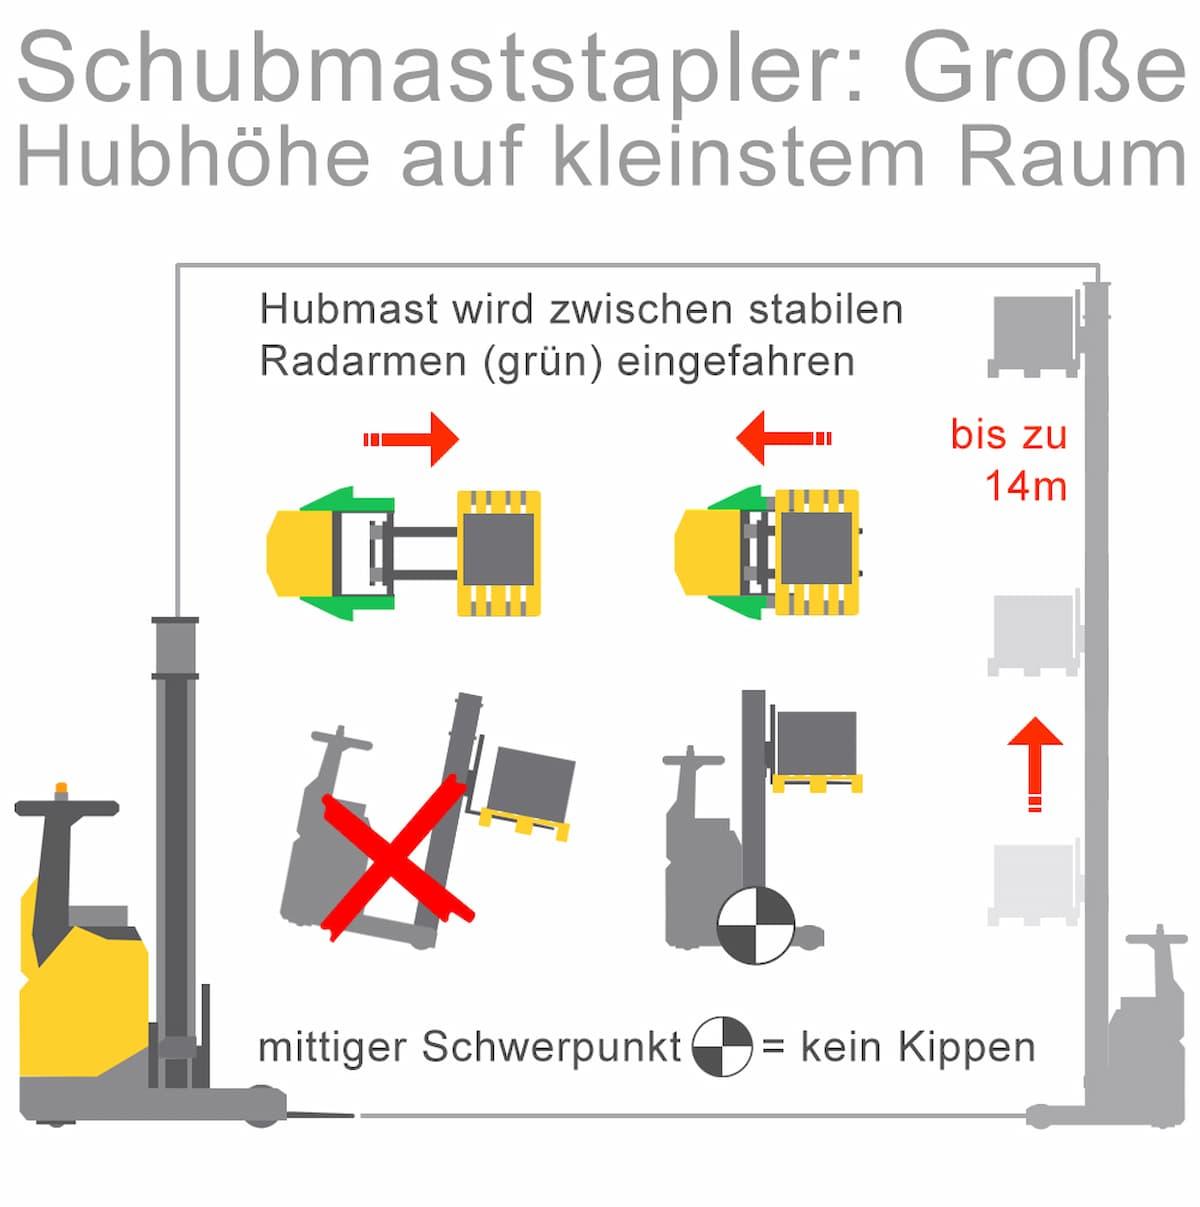 Schubmaststapler: Große Hubhöhe auf kleinstem Raum